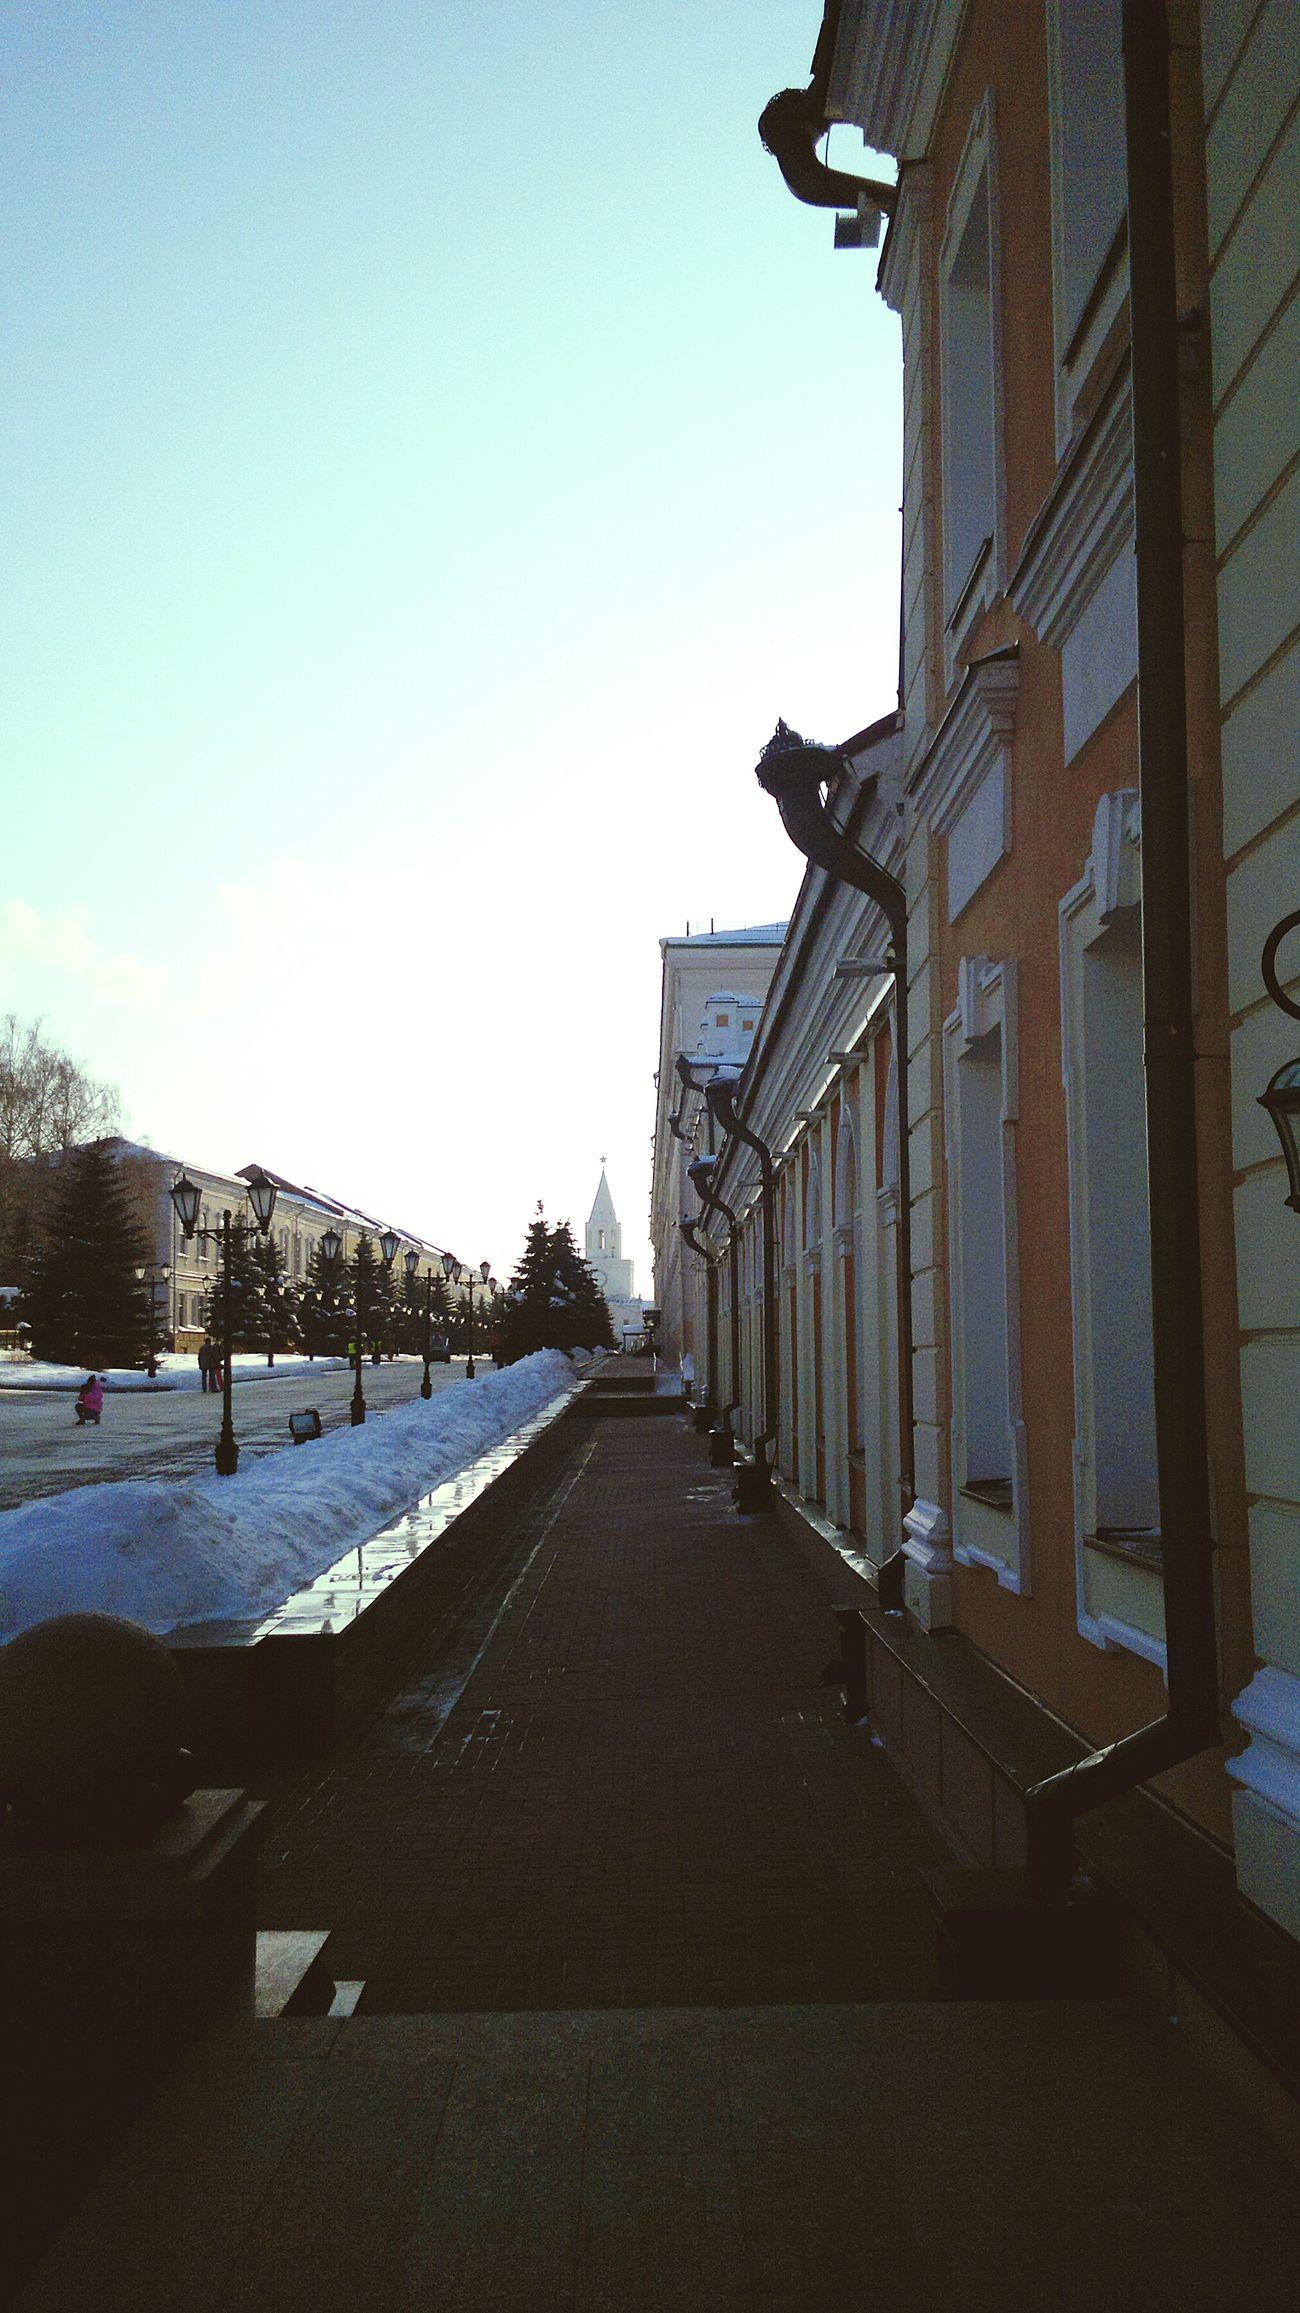 Kazan Clearsky Architecture Thekremlin KazanKremlin Early Morning History Emptystreet